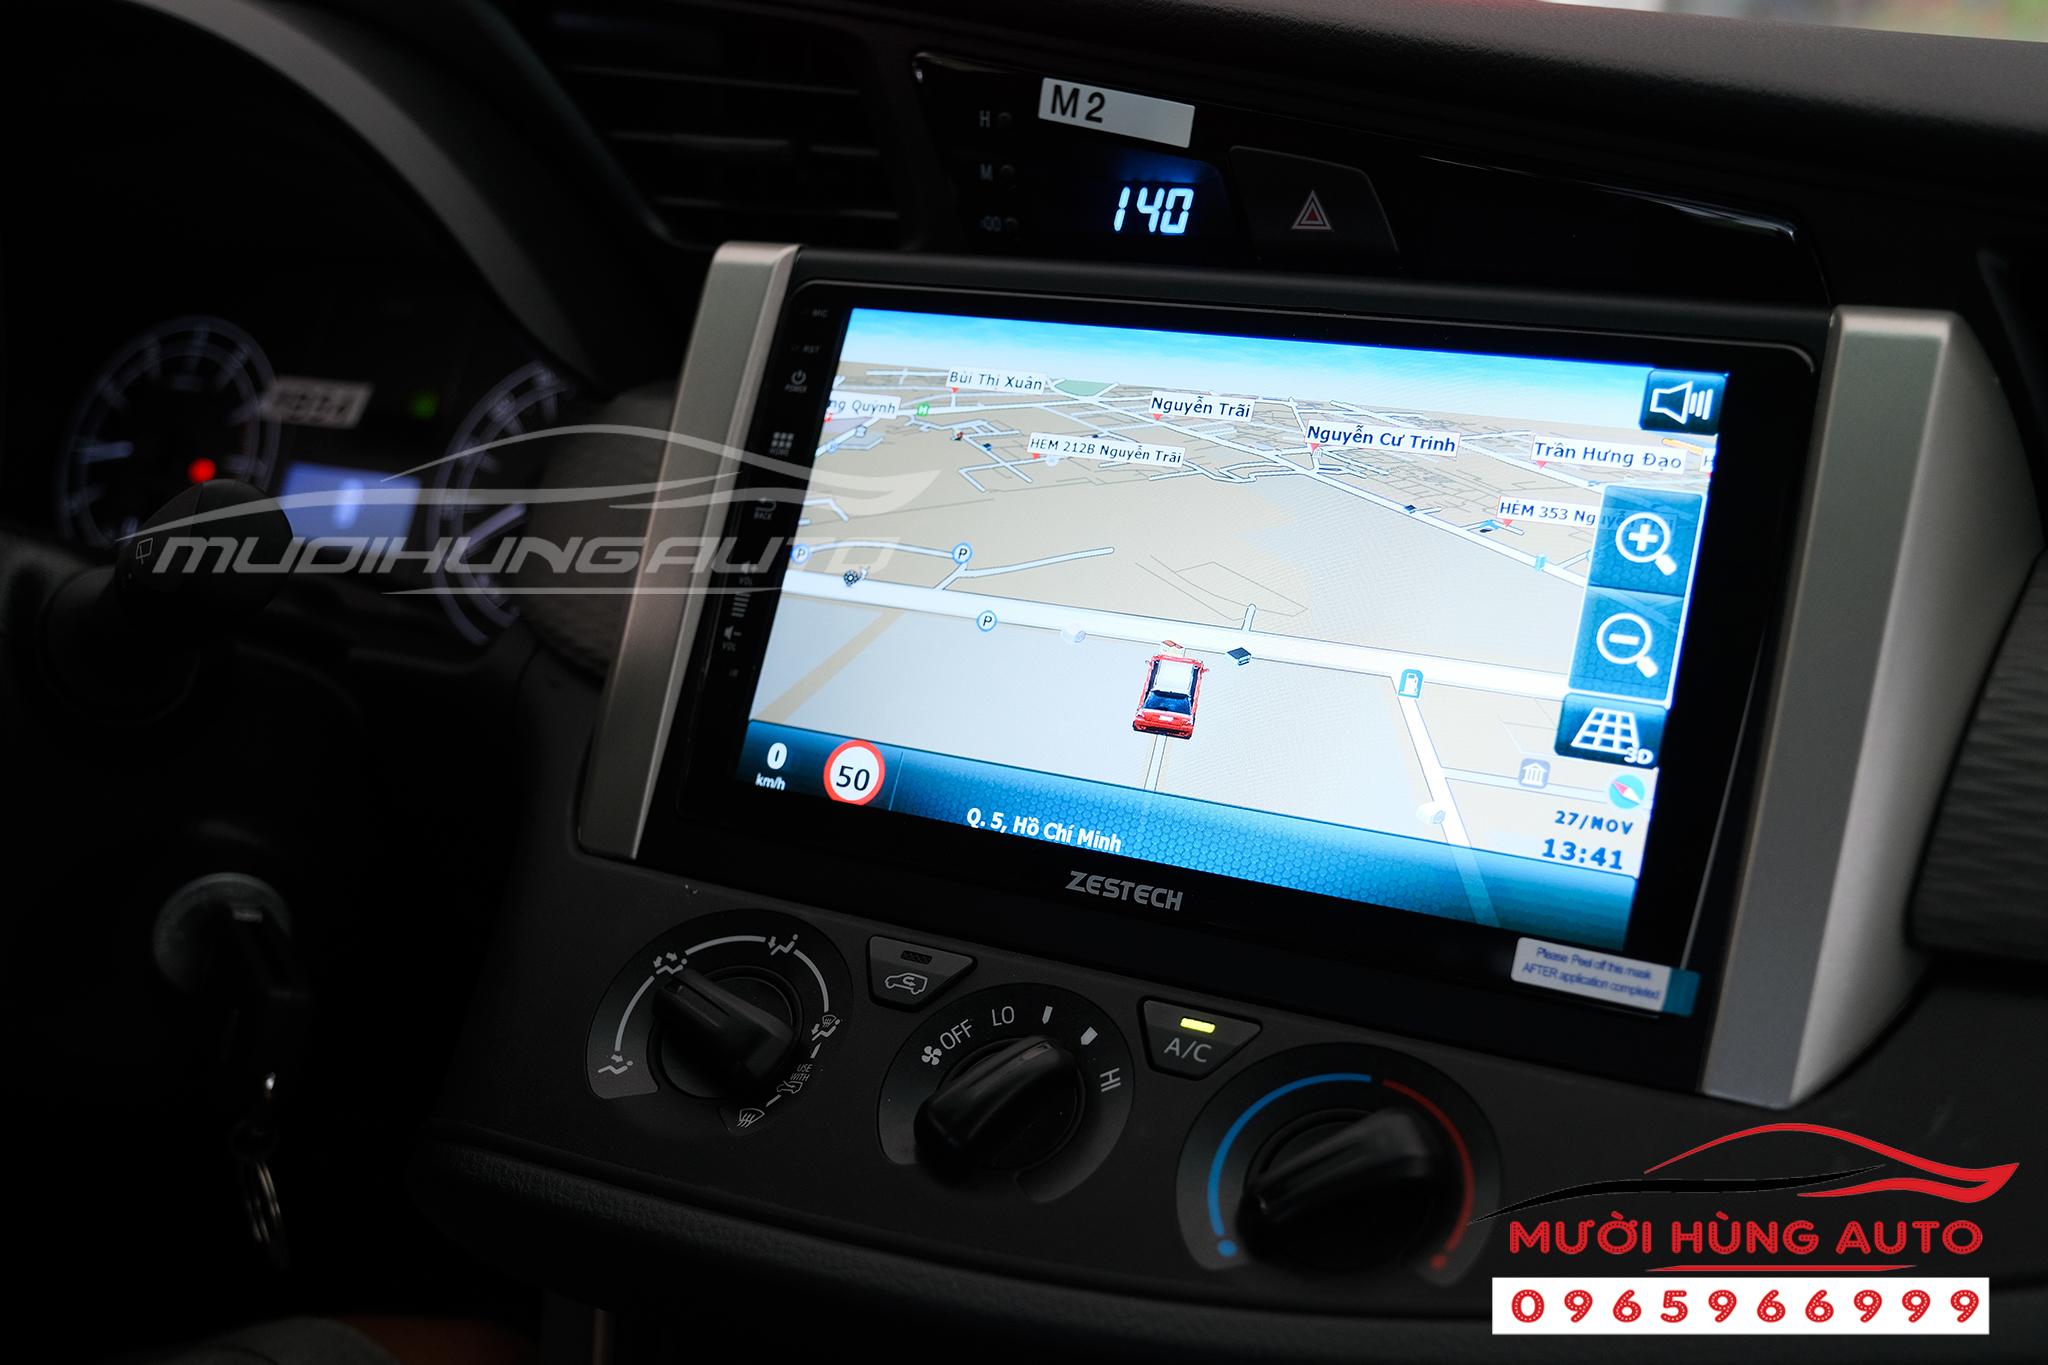 màn hình Toyota Innova 2018 Z500 Zestech